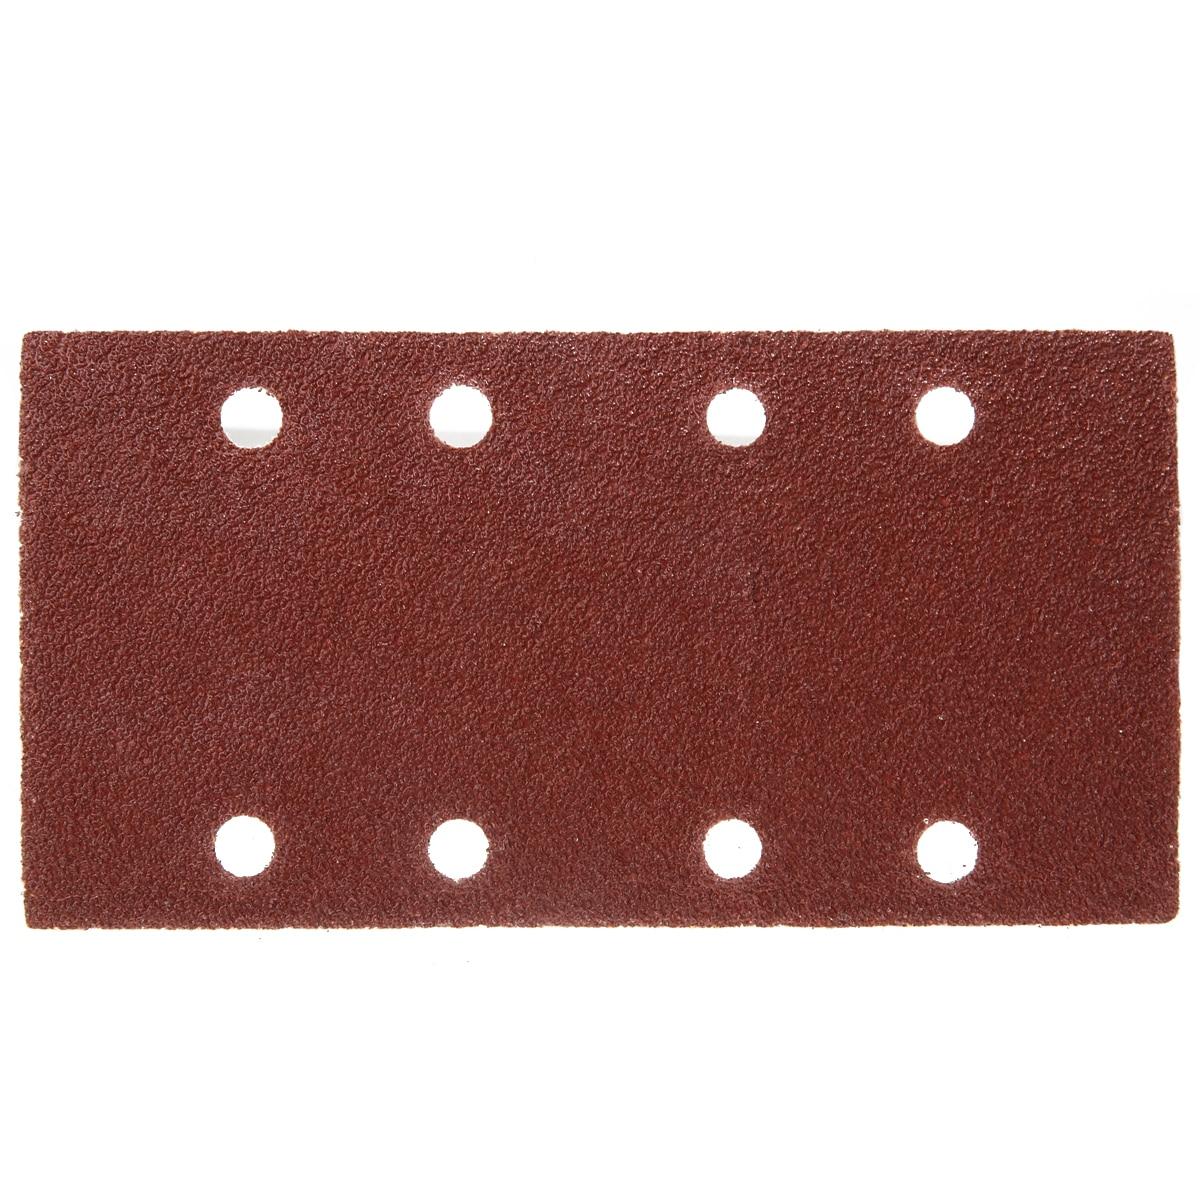 50pcs 8 Holes Sand Paper Sheets Rectangle Brown Sandpaper For Polishing Swing Grinder 40-120 Grit Orbital Sanders Tools 93*185mm